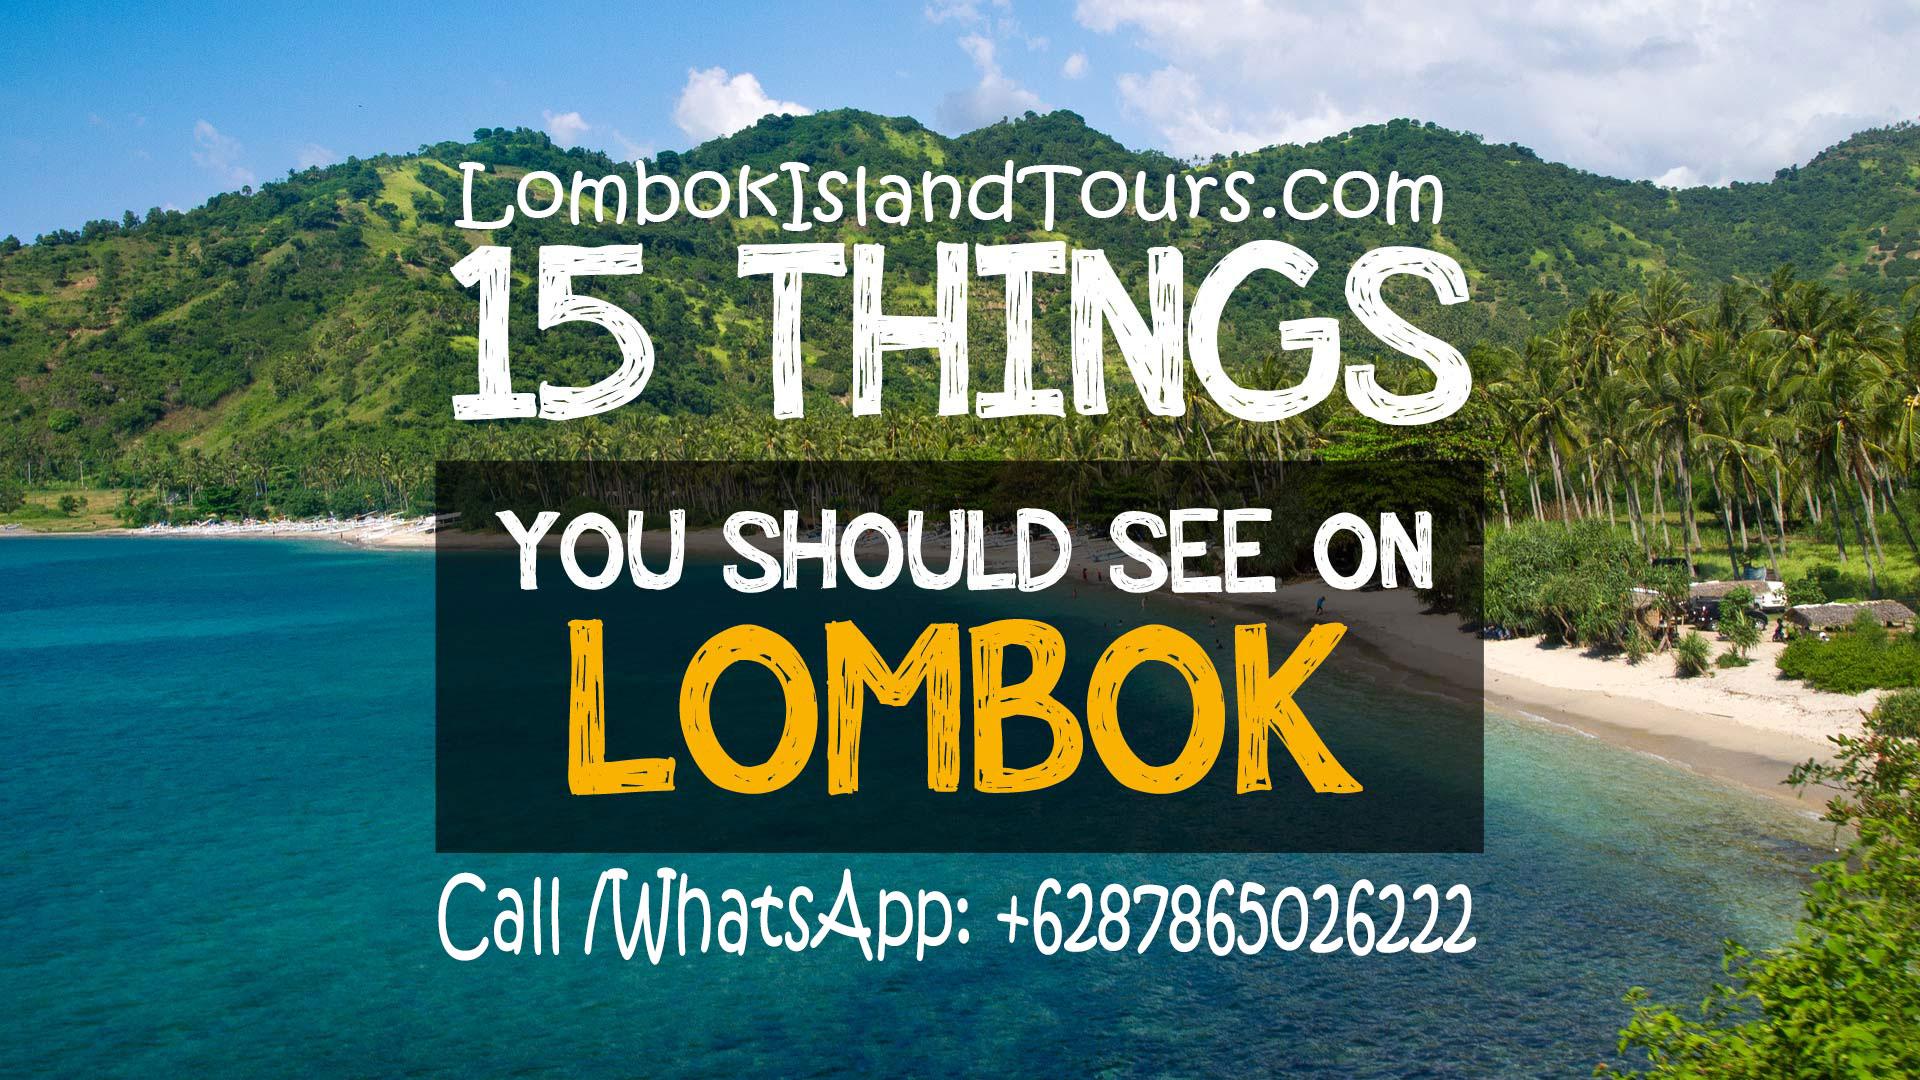 lombok-island-gili-trawangan-sumbawa-tour-+6287865026222